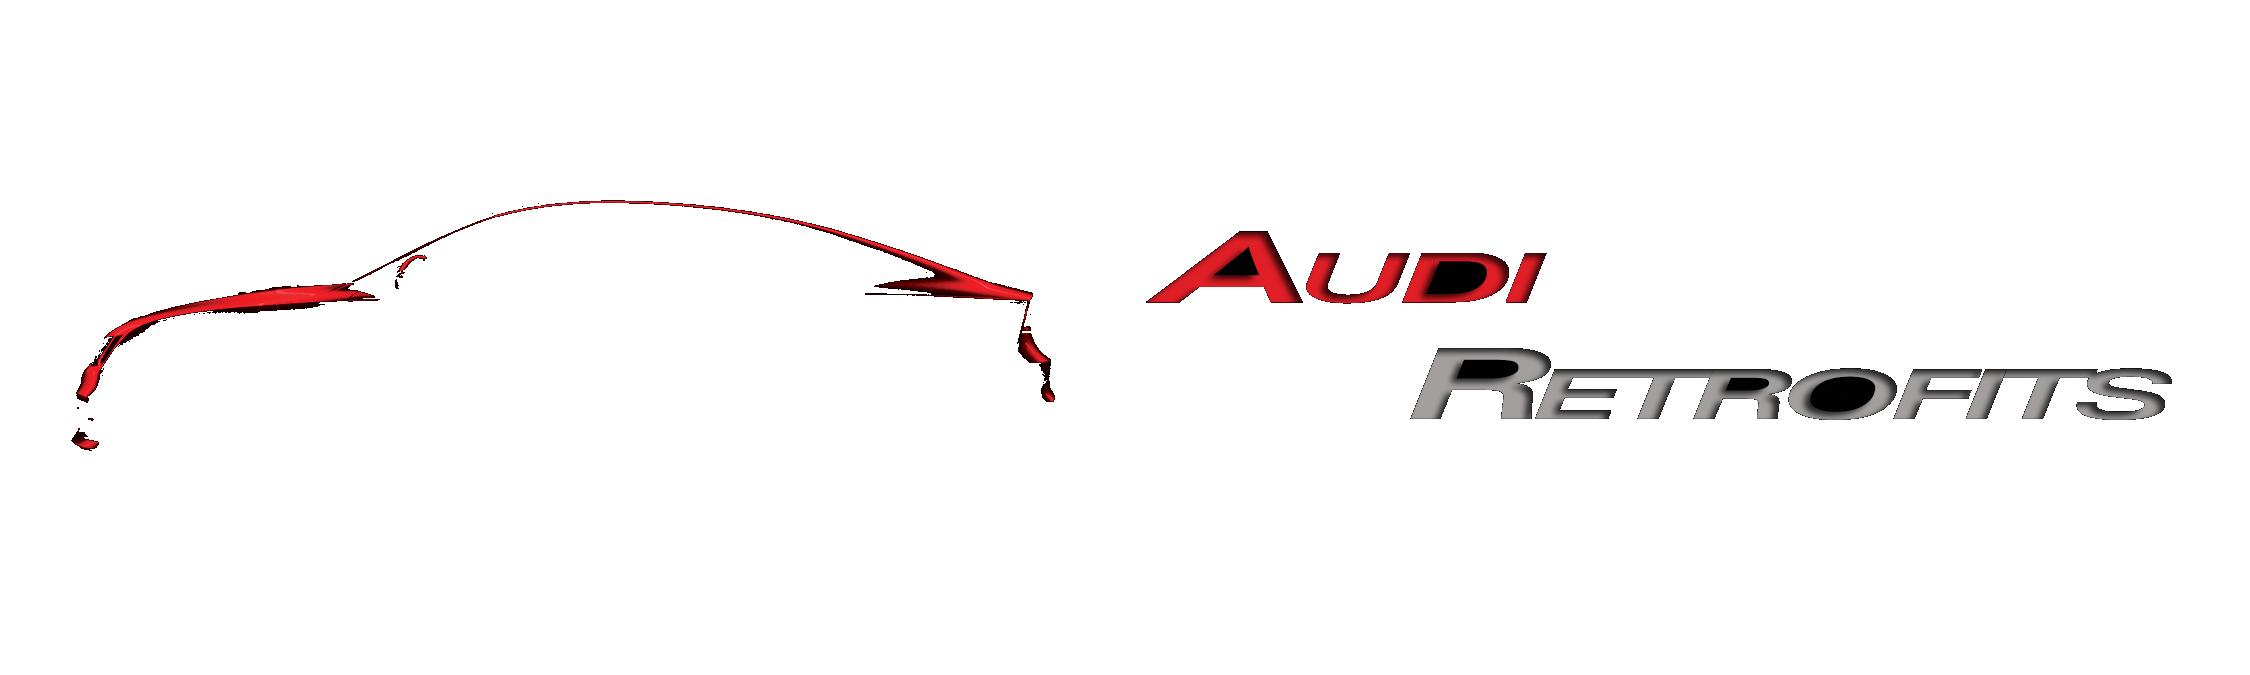 Audi Retrofits